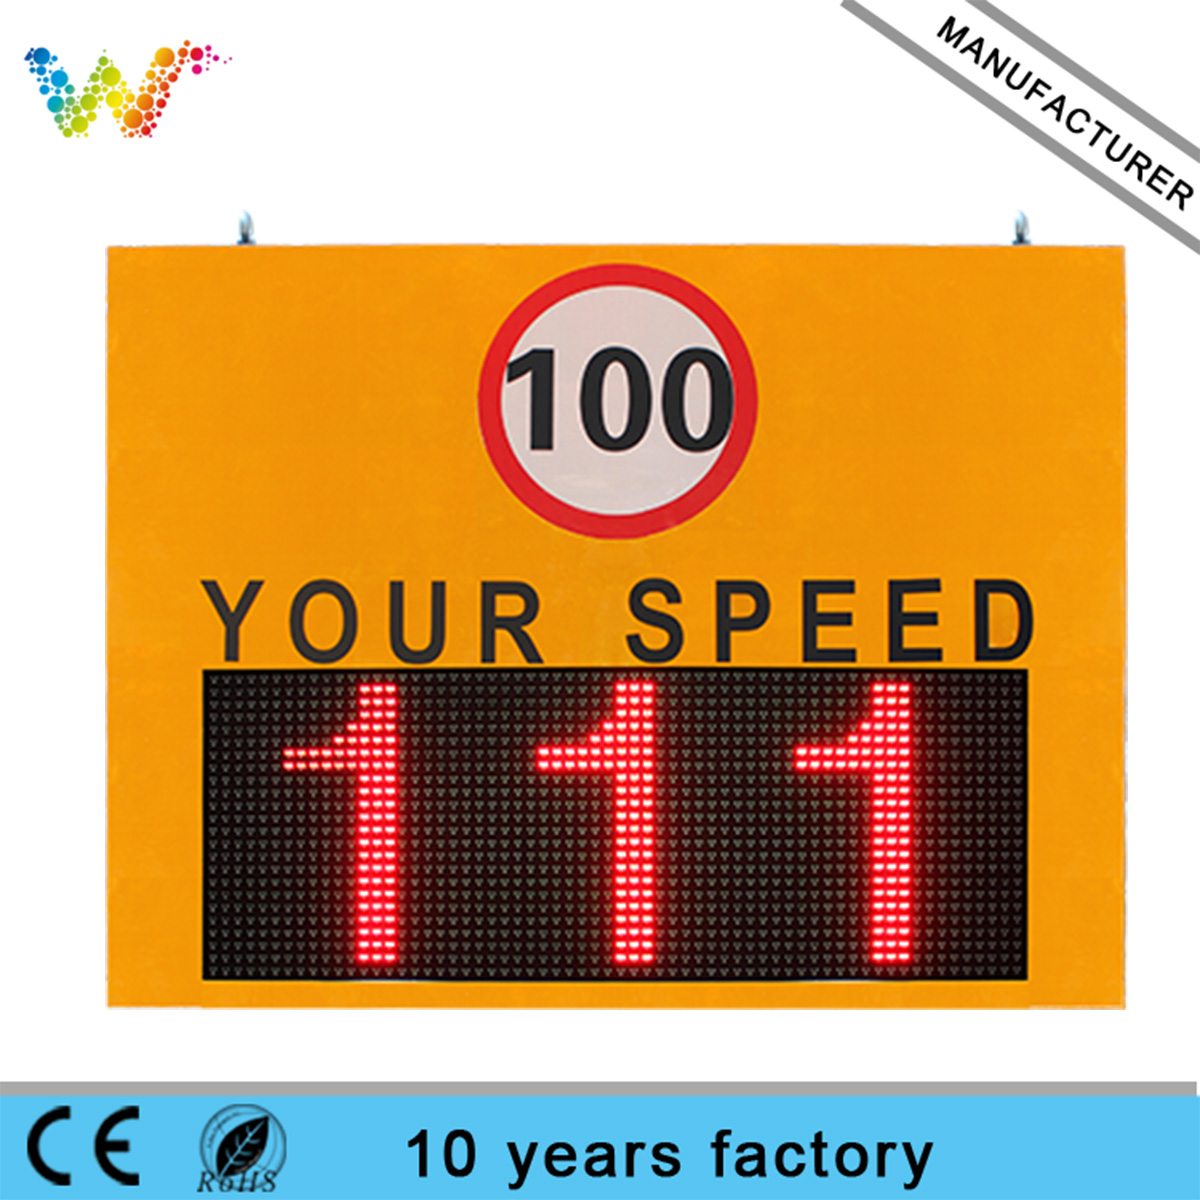 Variable Messaging Board radar Speed Limit Signs Highway Traffic LED Display Screen